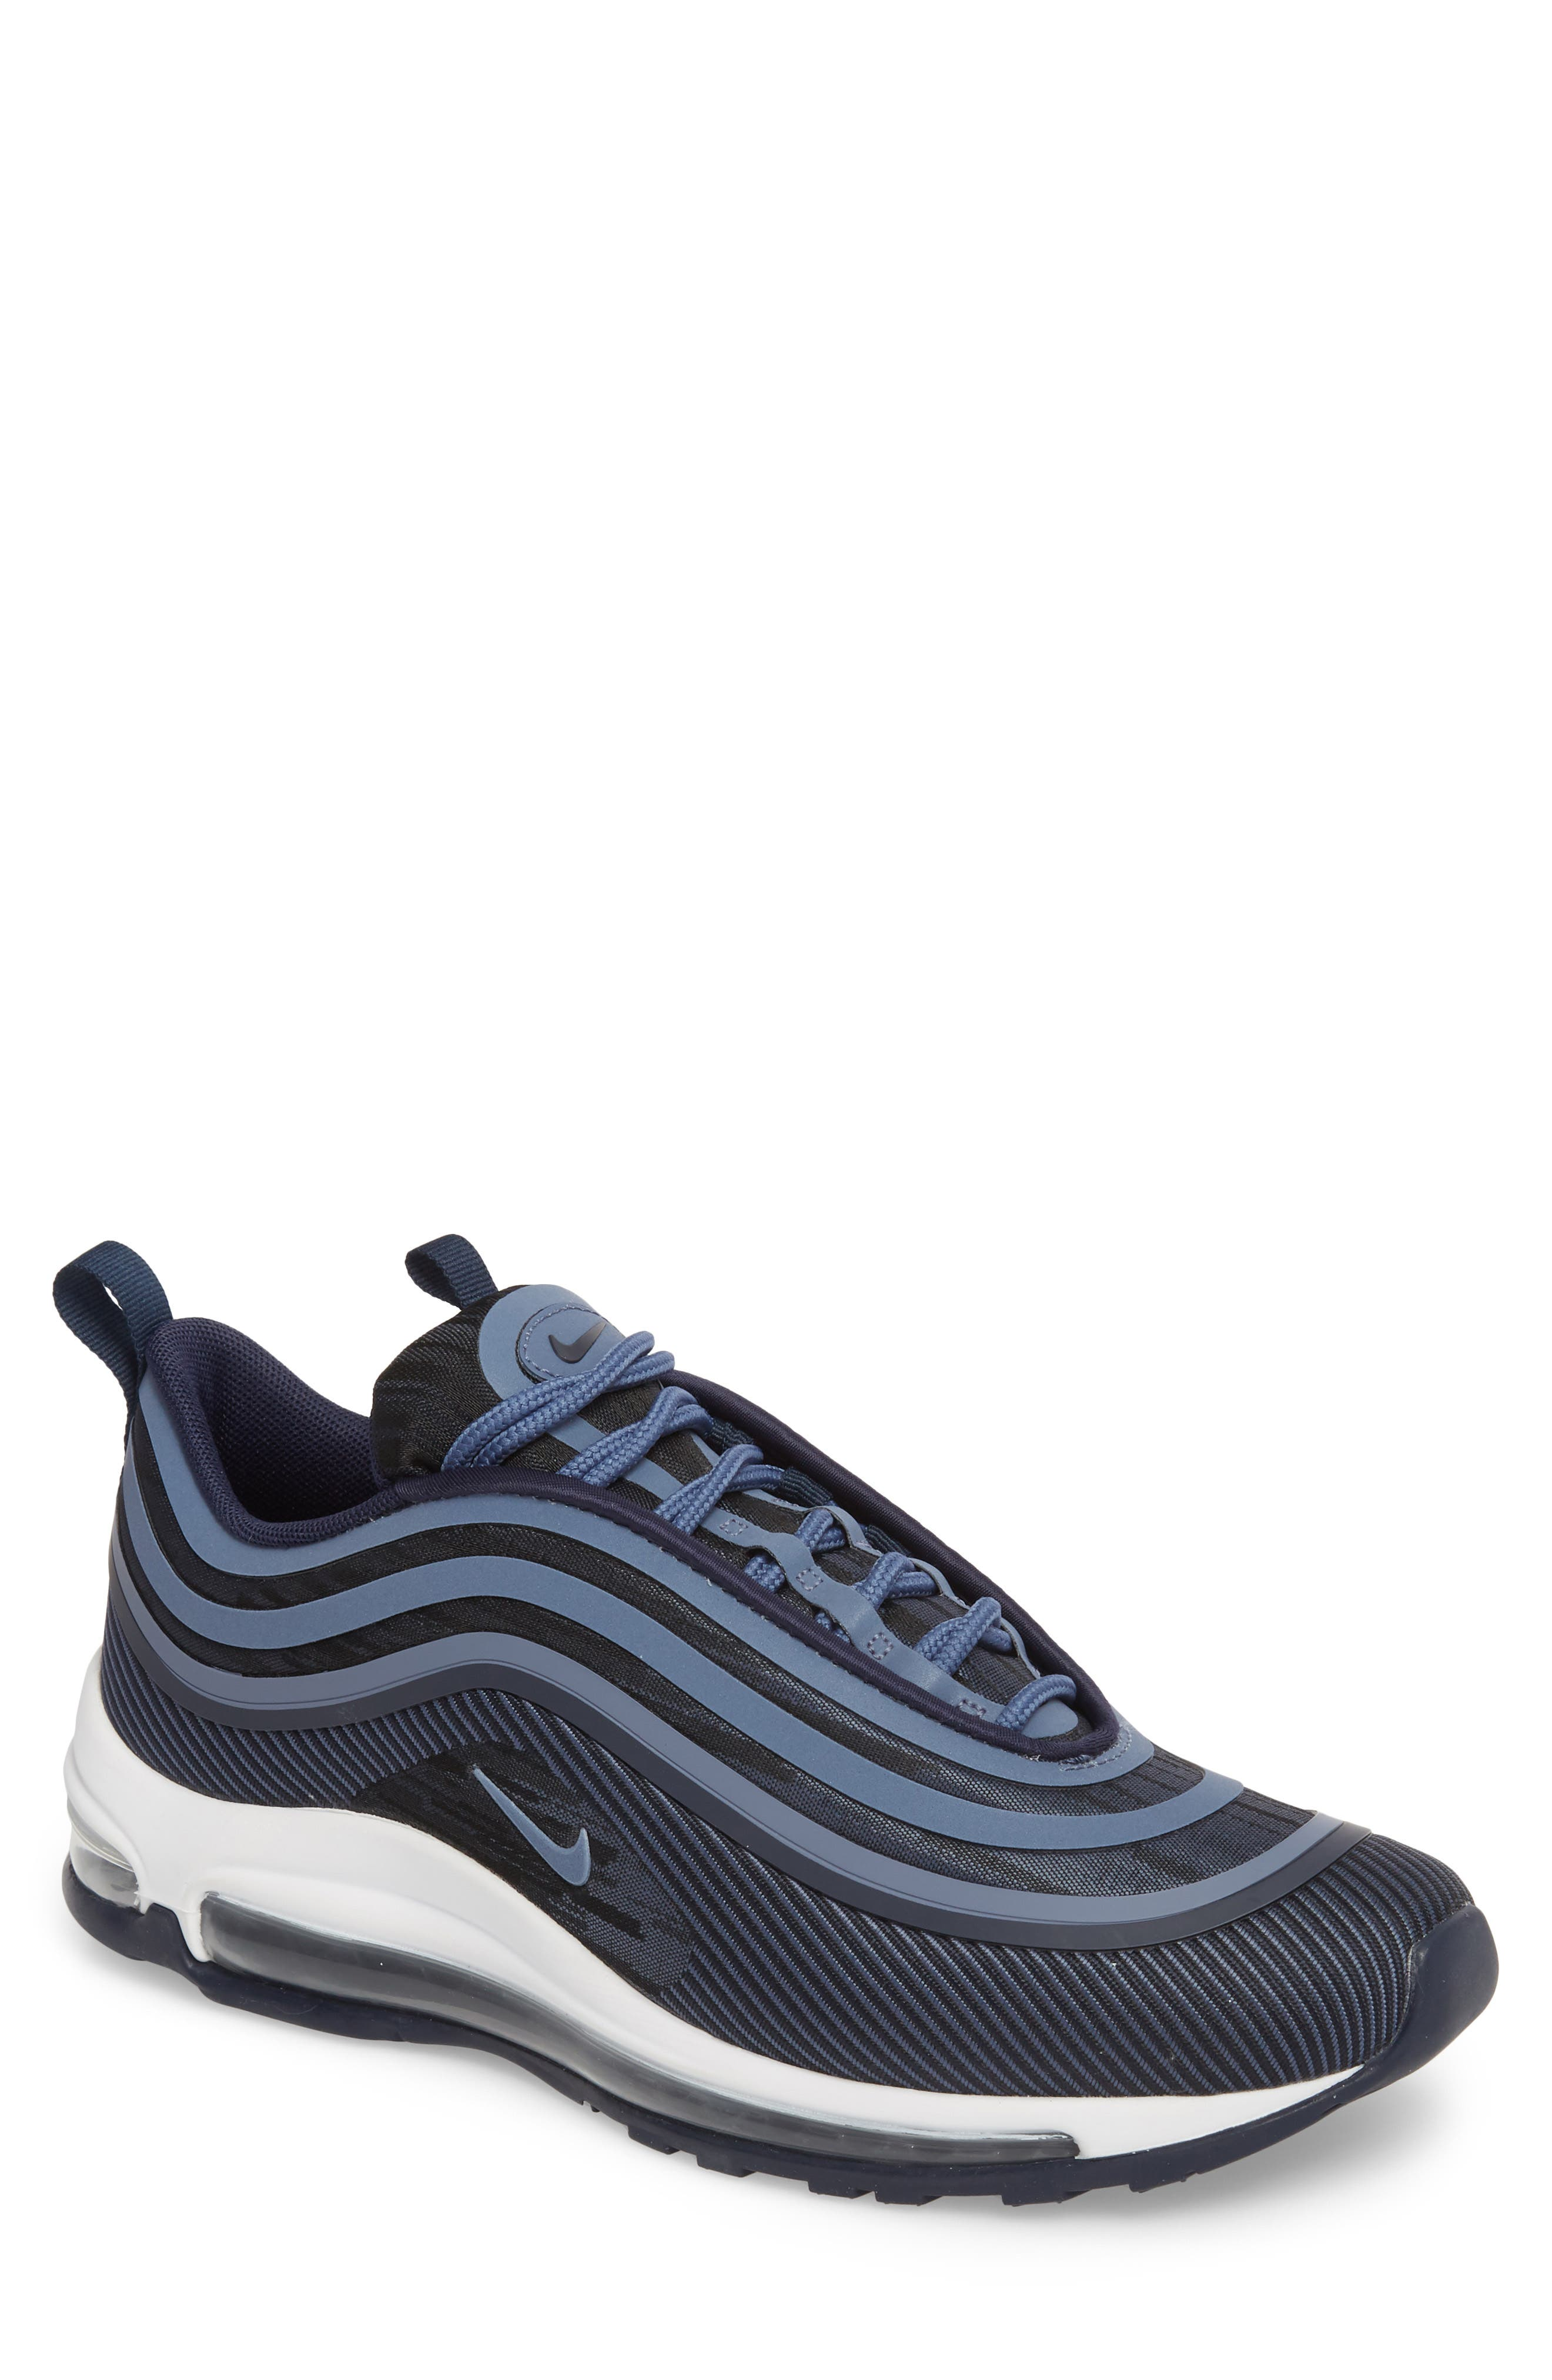 Cheap 213159 Nike Free 4.3 Unisex Dark Gray Jade Shoes